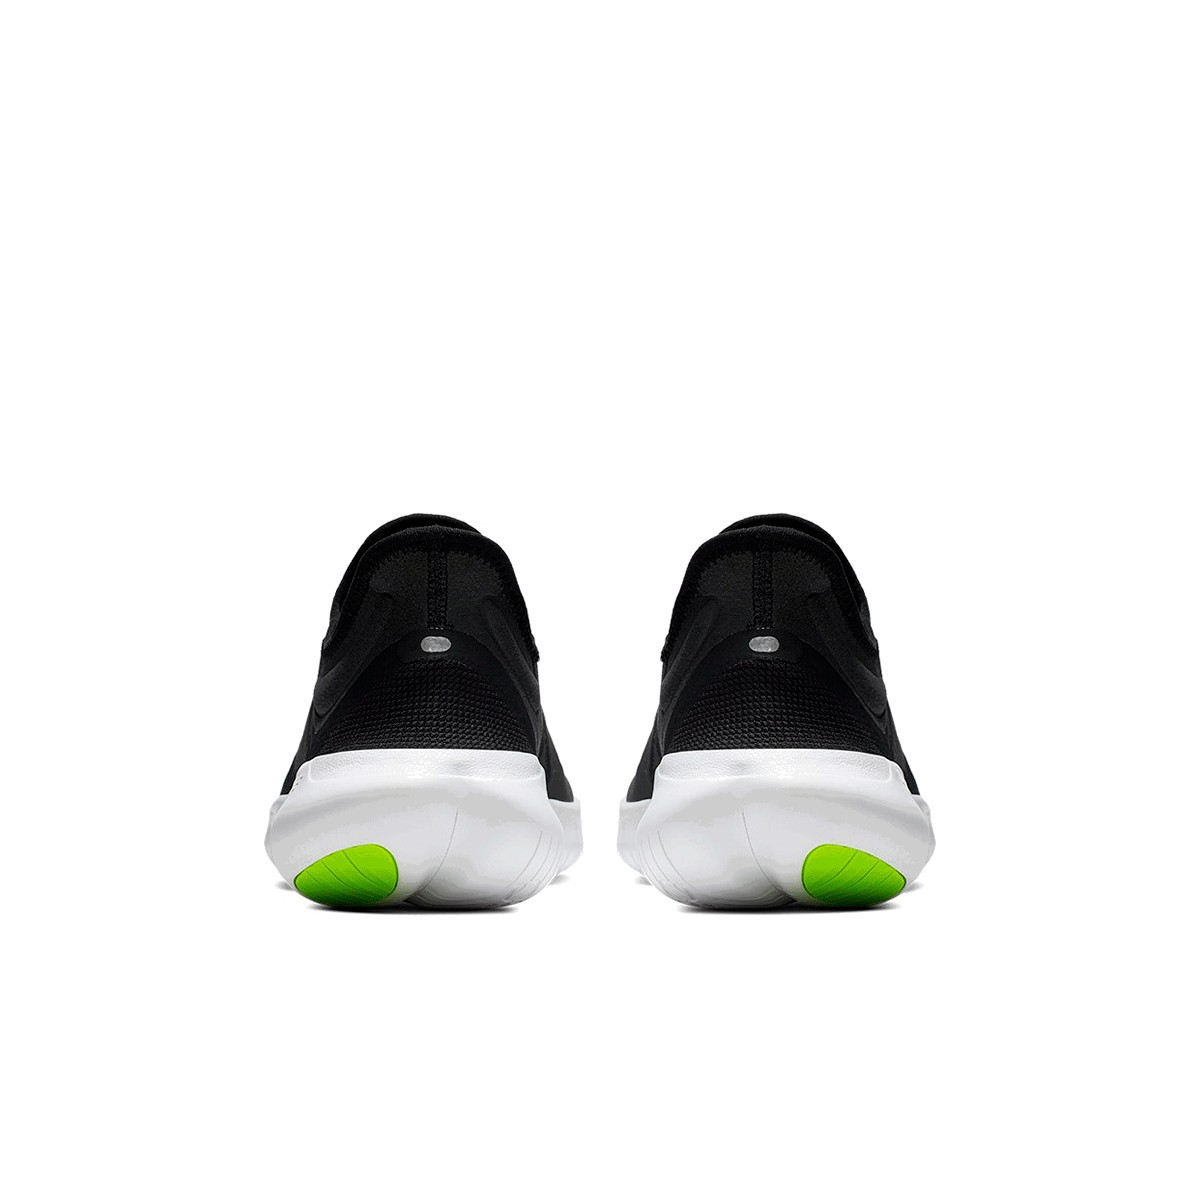 Tênis Nike Free Run 5.0 Masculino Preto